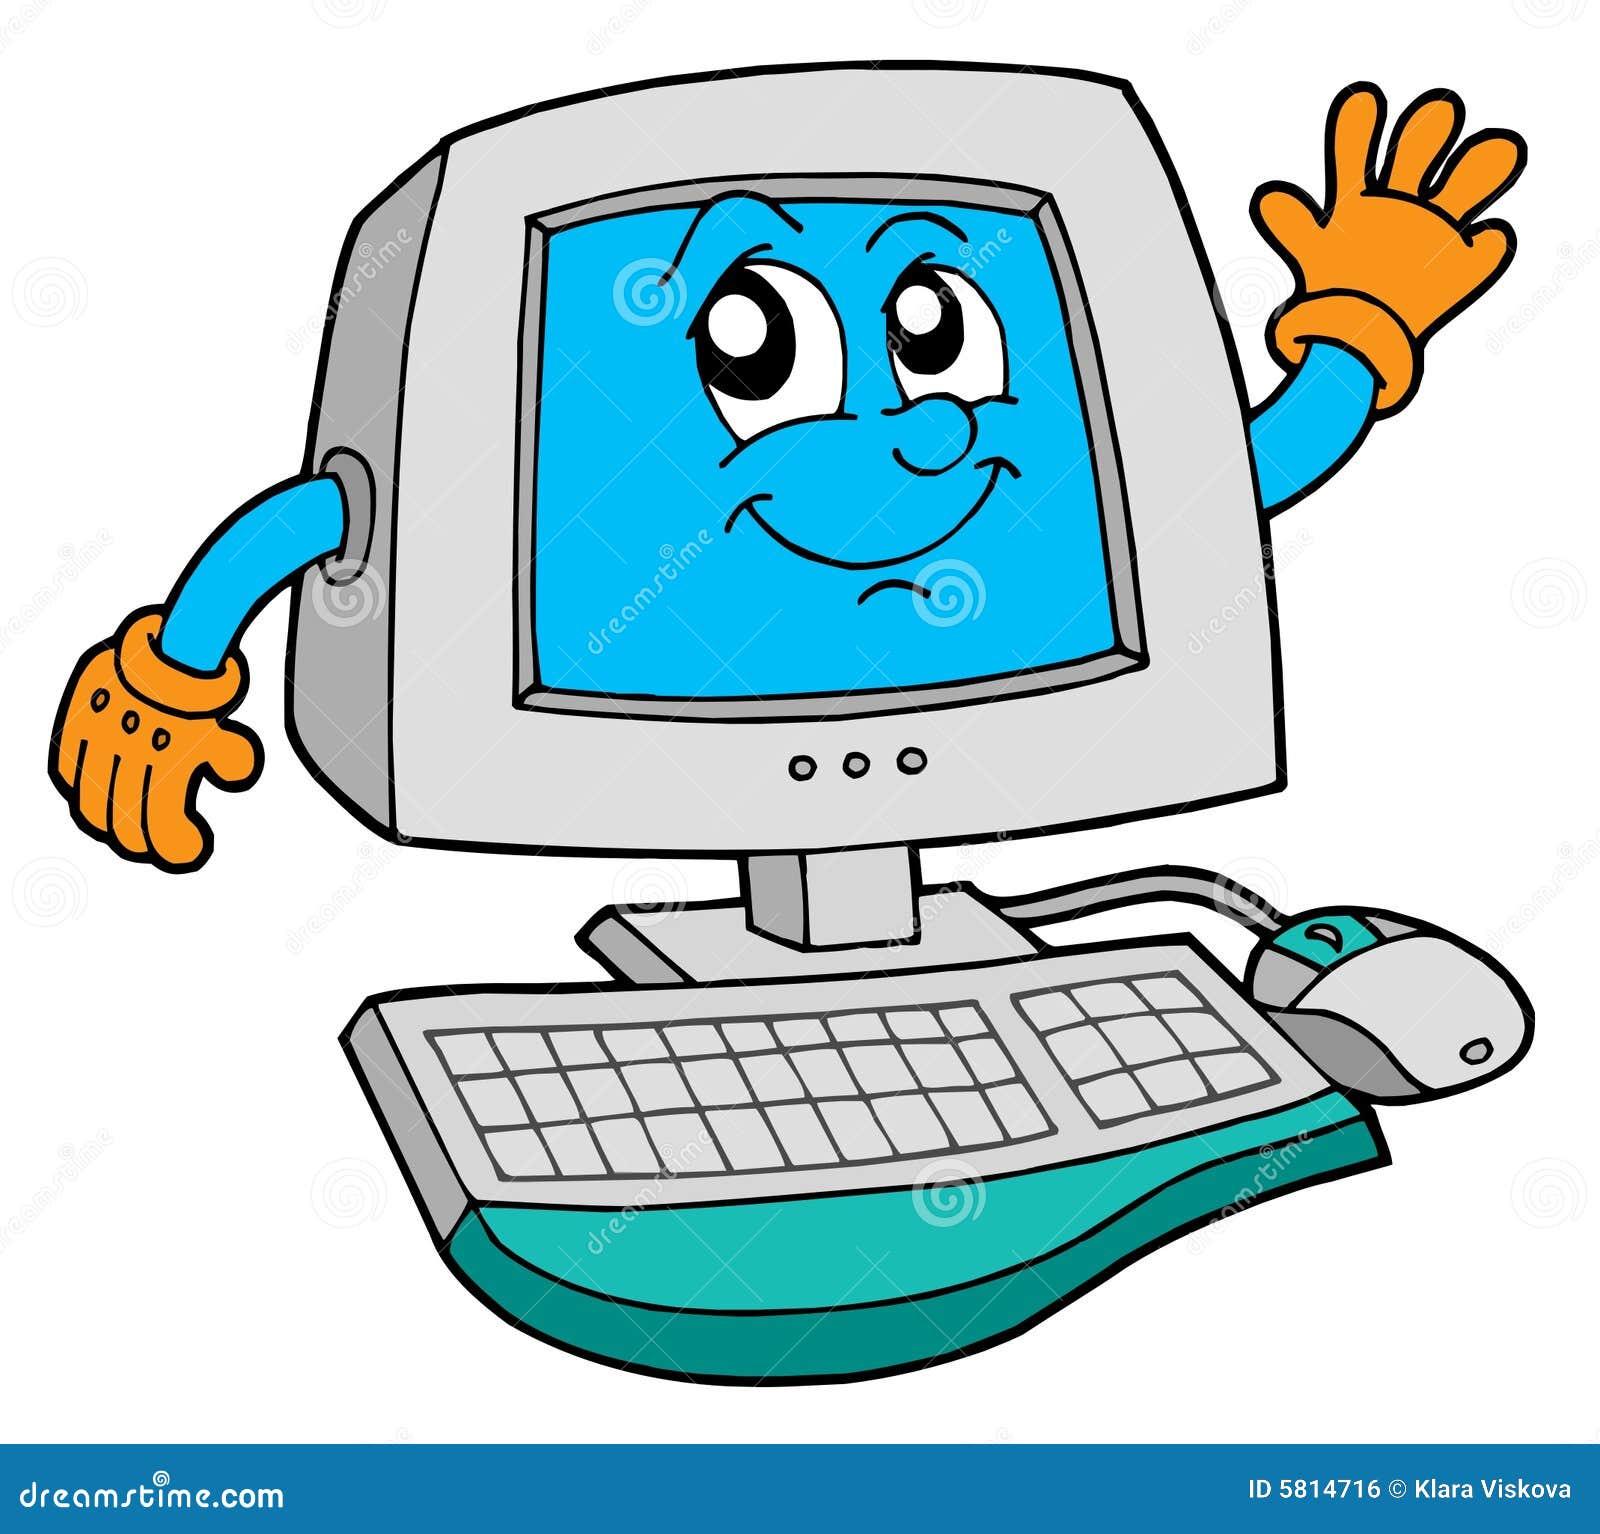 Animation computers